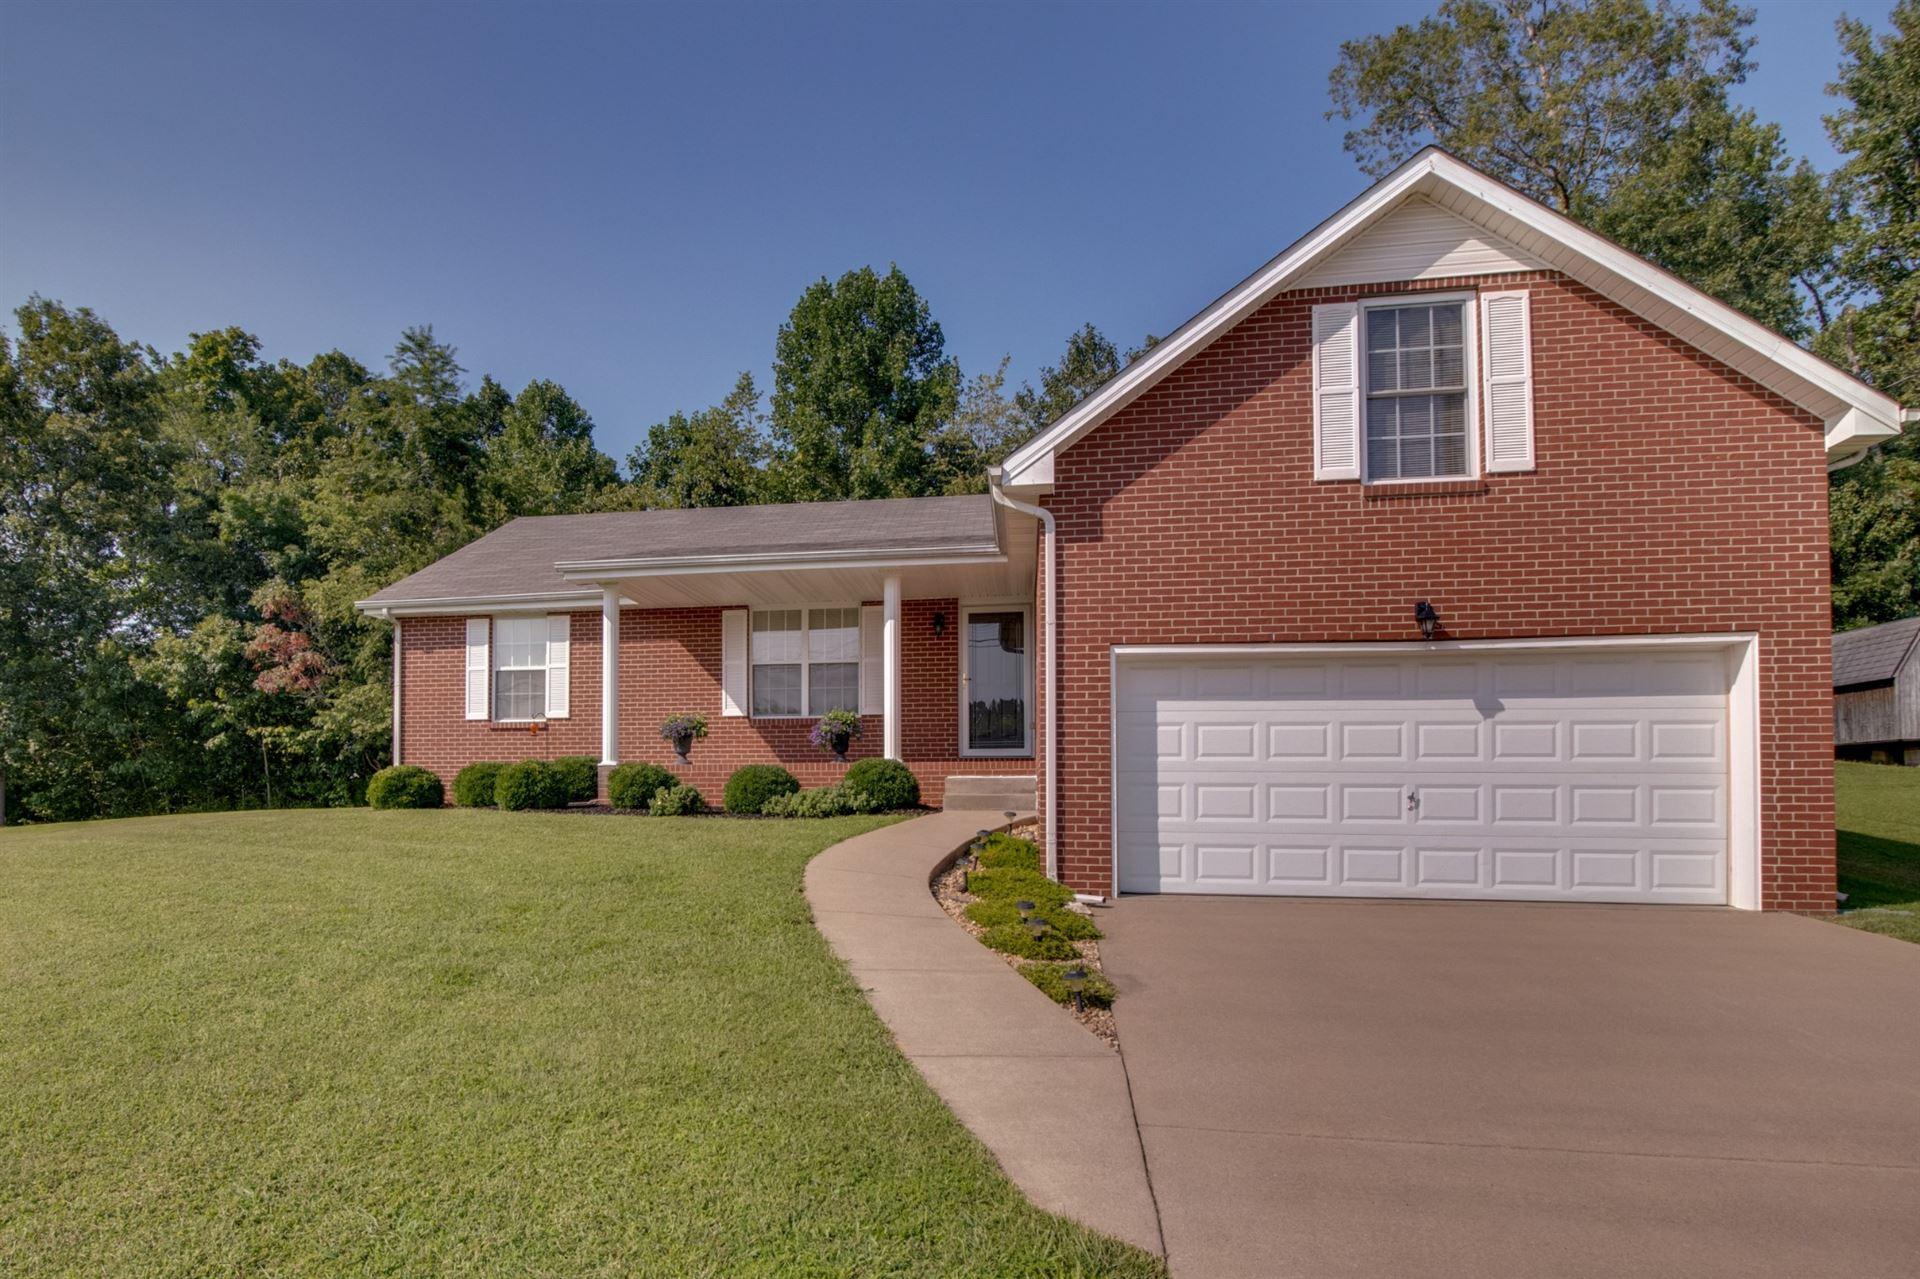 319 Cottonwood Ct, Clarksville, TN 37040 - MLS#: 2187693